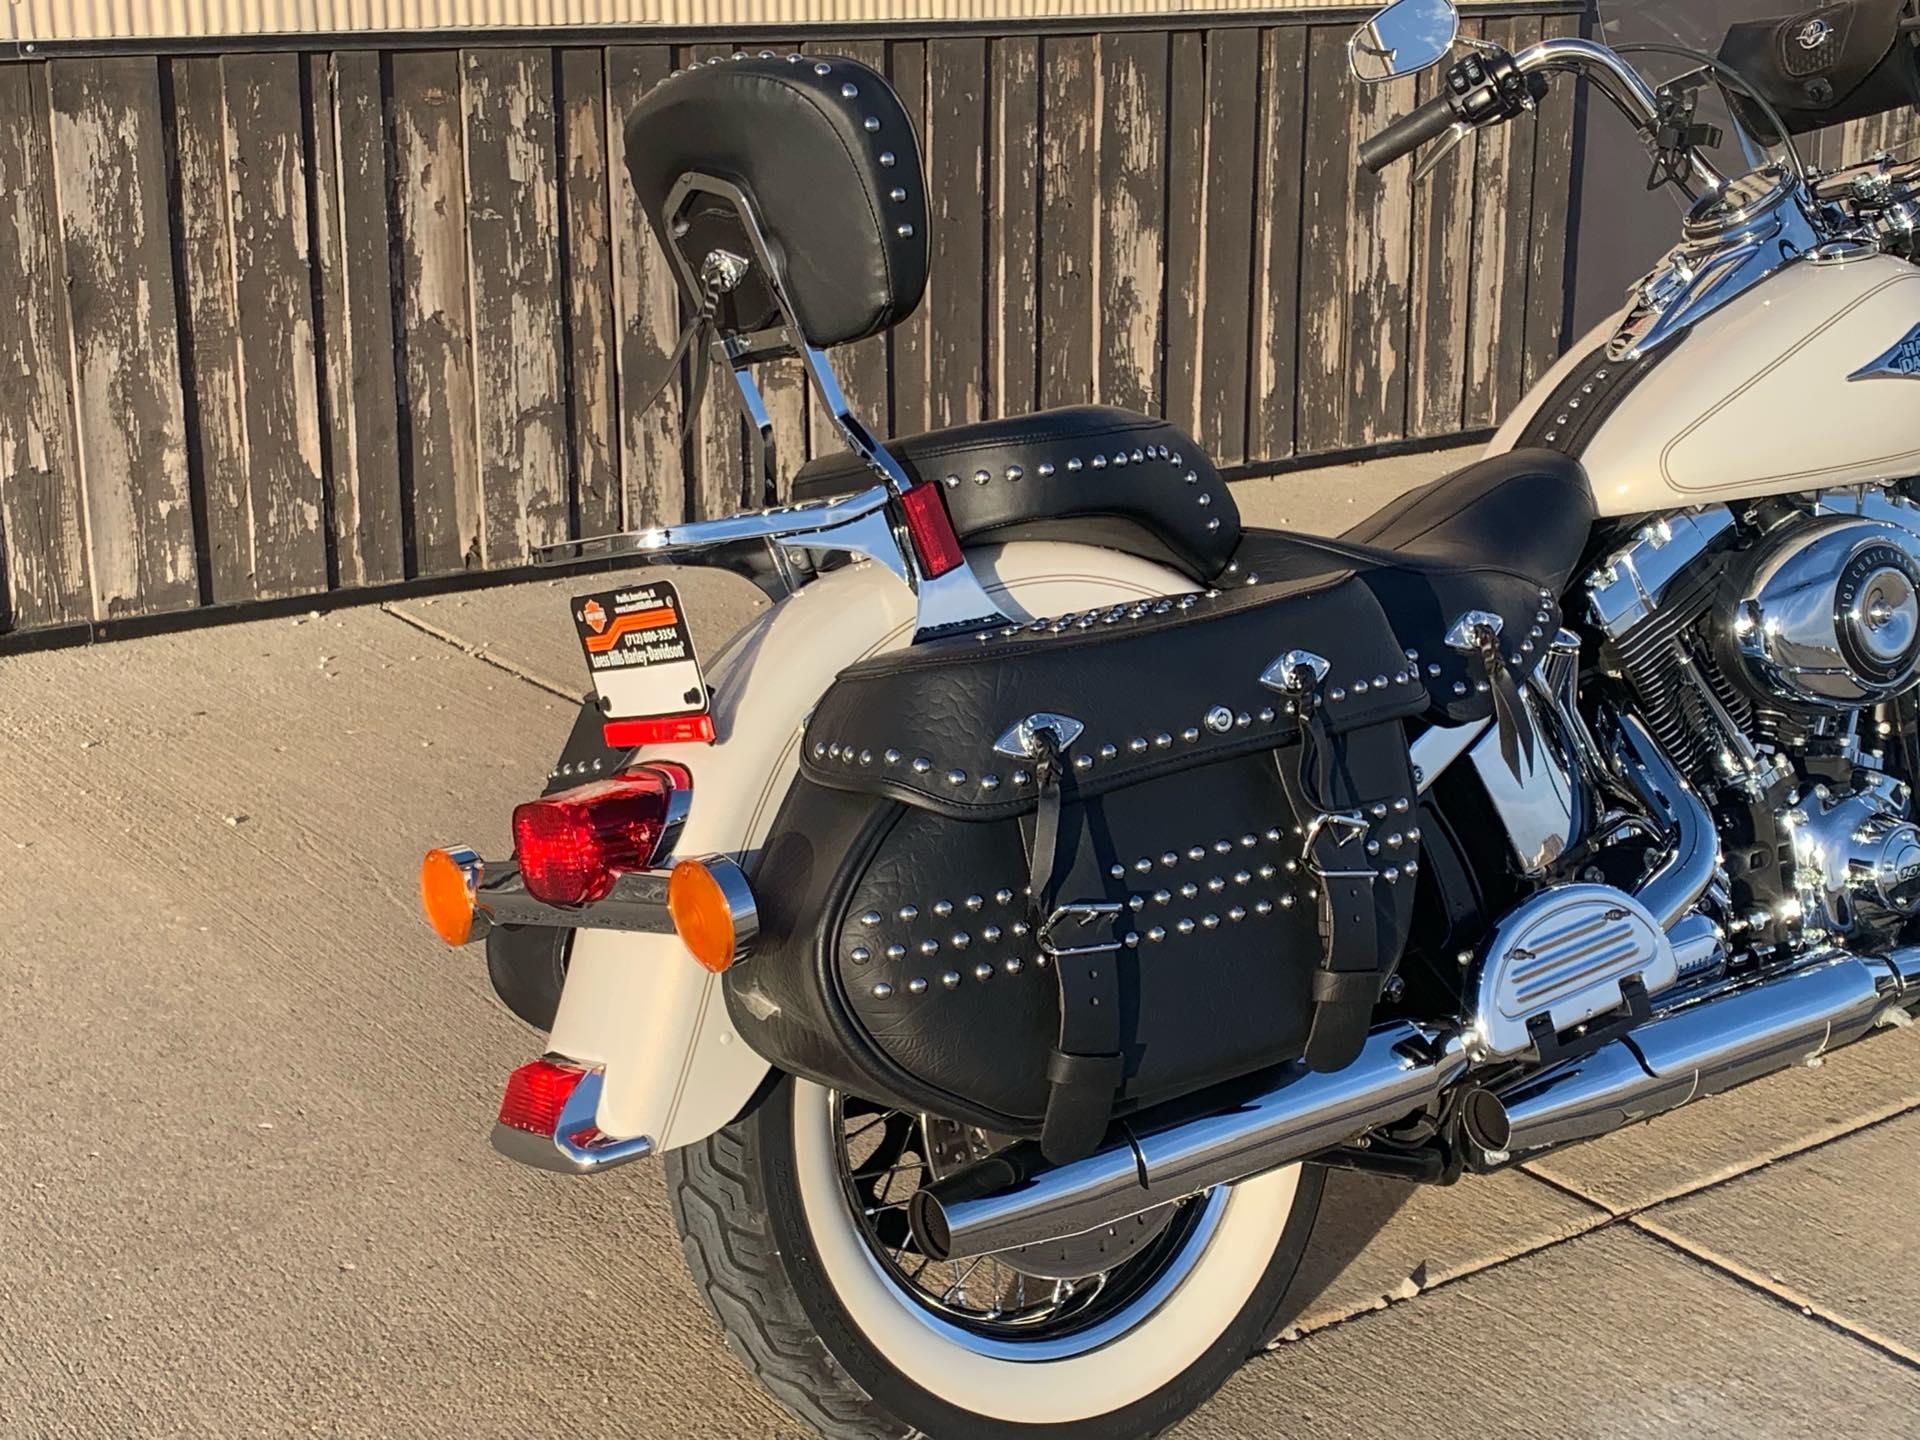 2015 Harley-Davidson Softail Heritage Softail Classic at Loess Hills Harley-Davidson